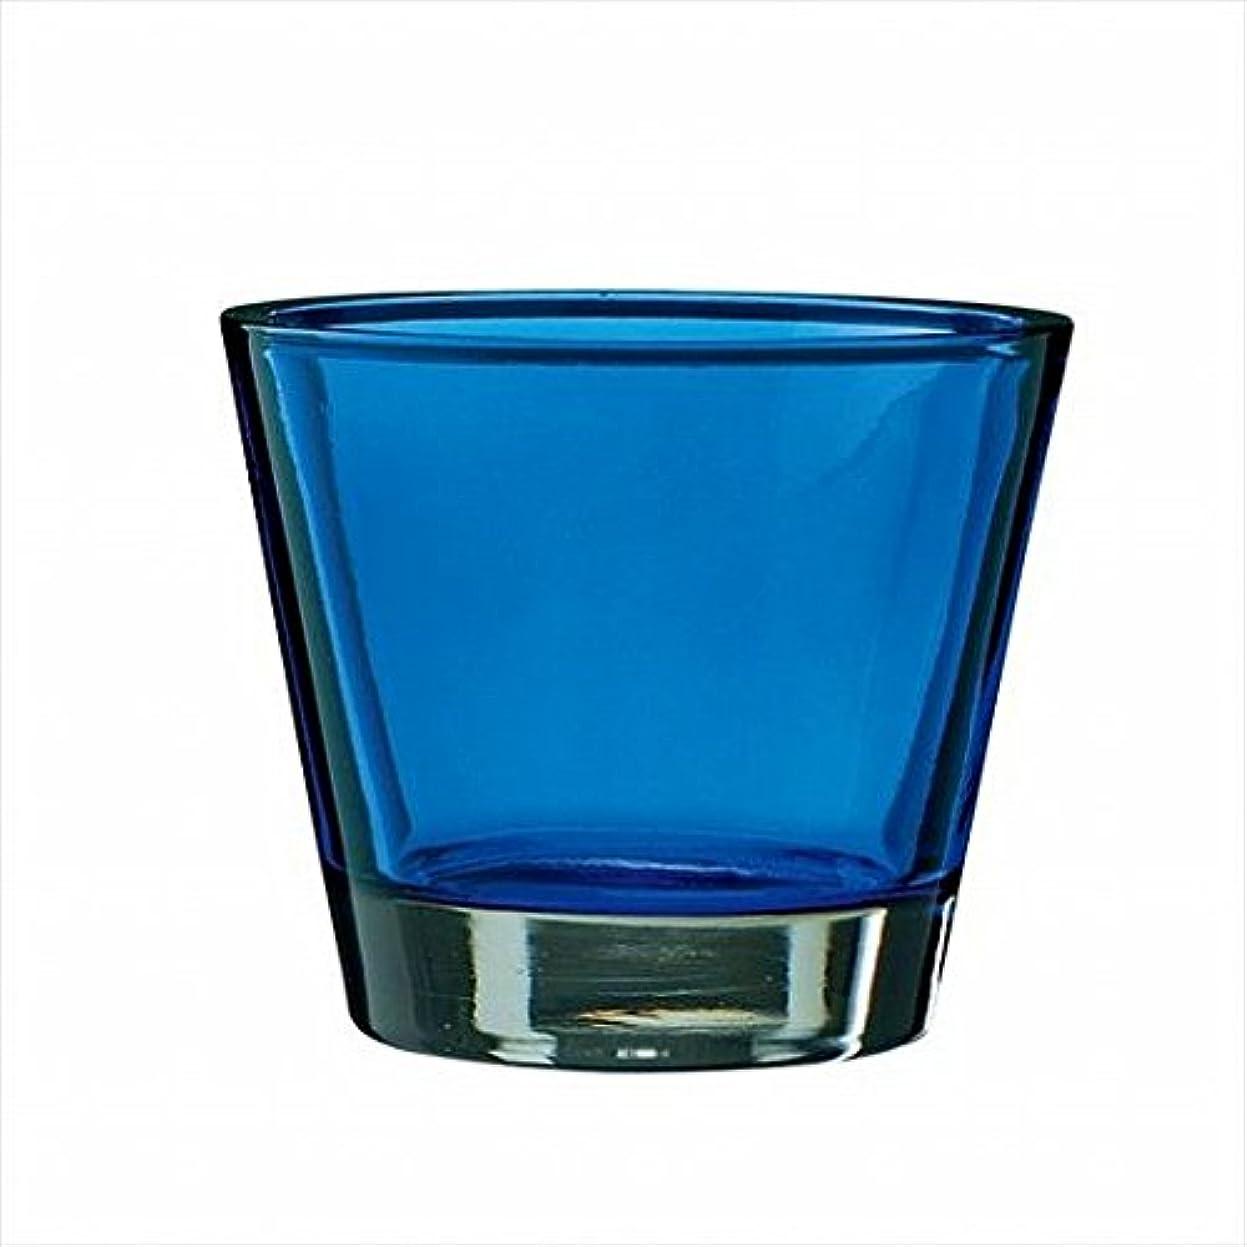 kameyama candle(カメヤマキャンドル) カラリス 「 ブルー 」 キャンドル 82x82x70mm (J2540000B)